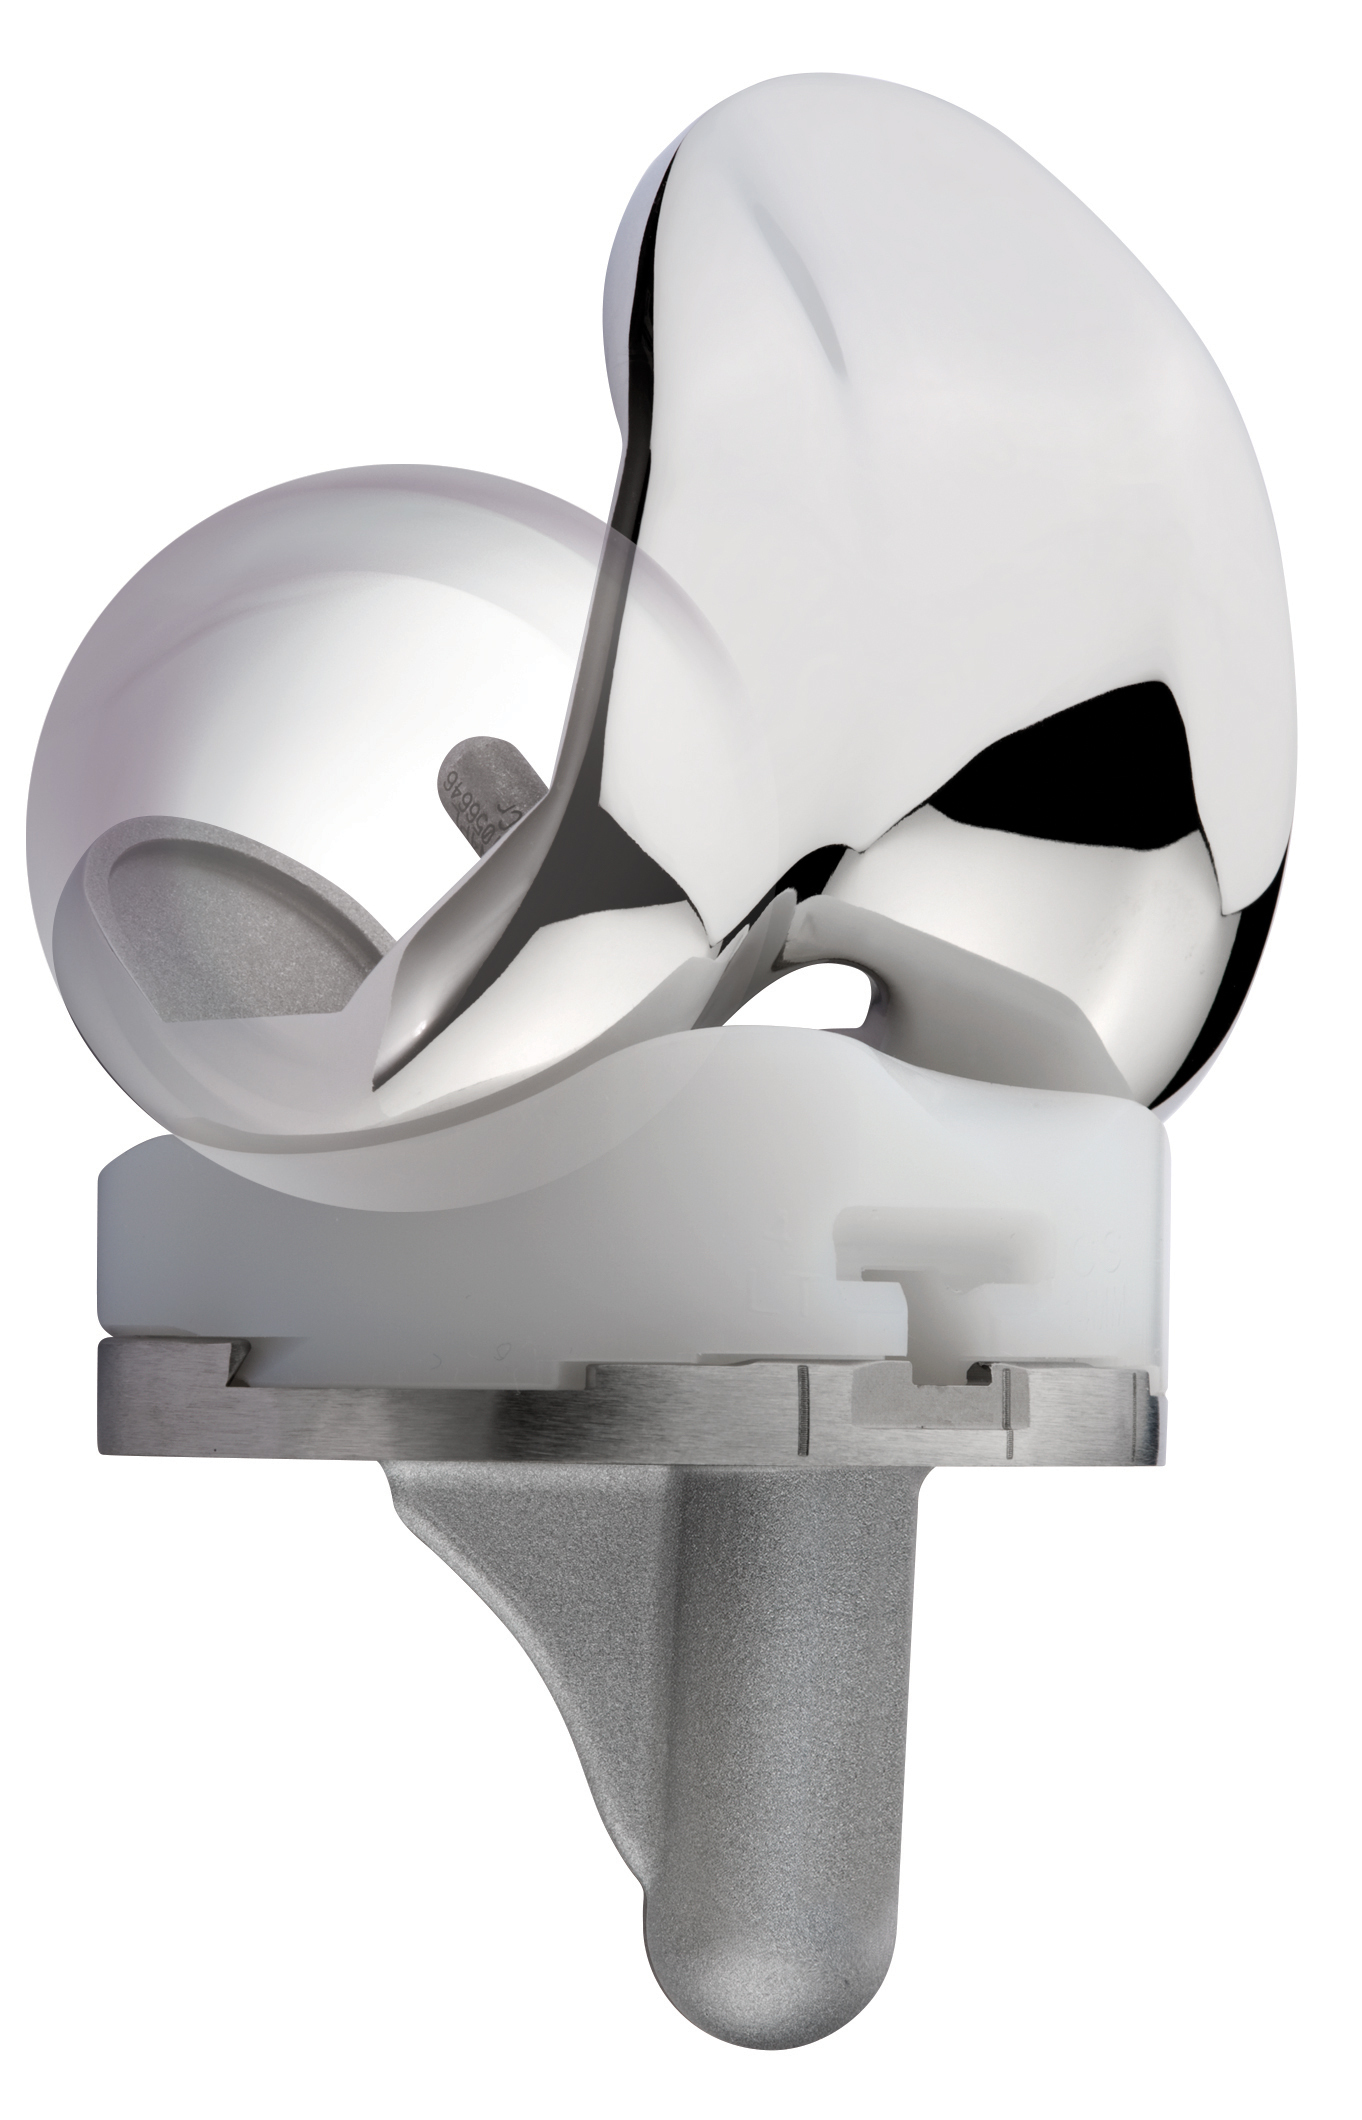 Samenvatting: MicroPort Orthopedics viert 20 jaar stabiliteit met ...